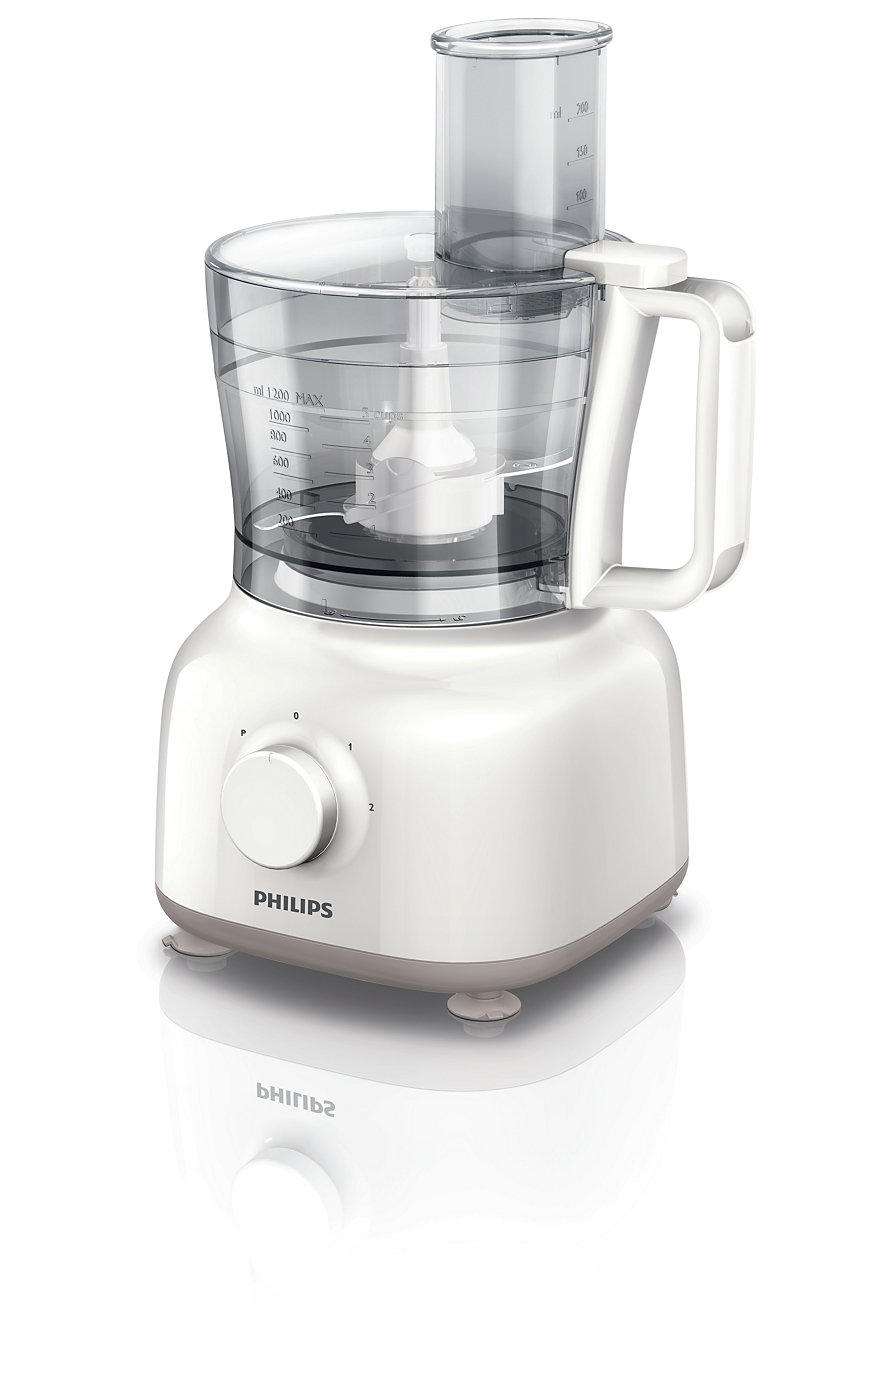 Кухонный комбайн Philips HR7628/00 цена